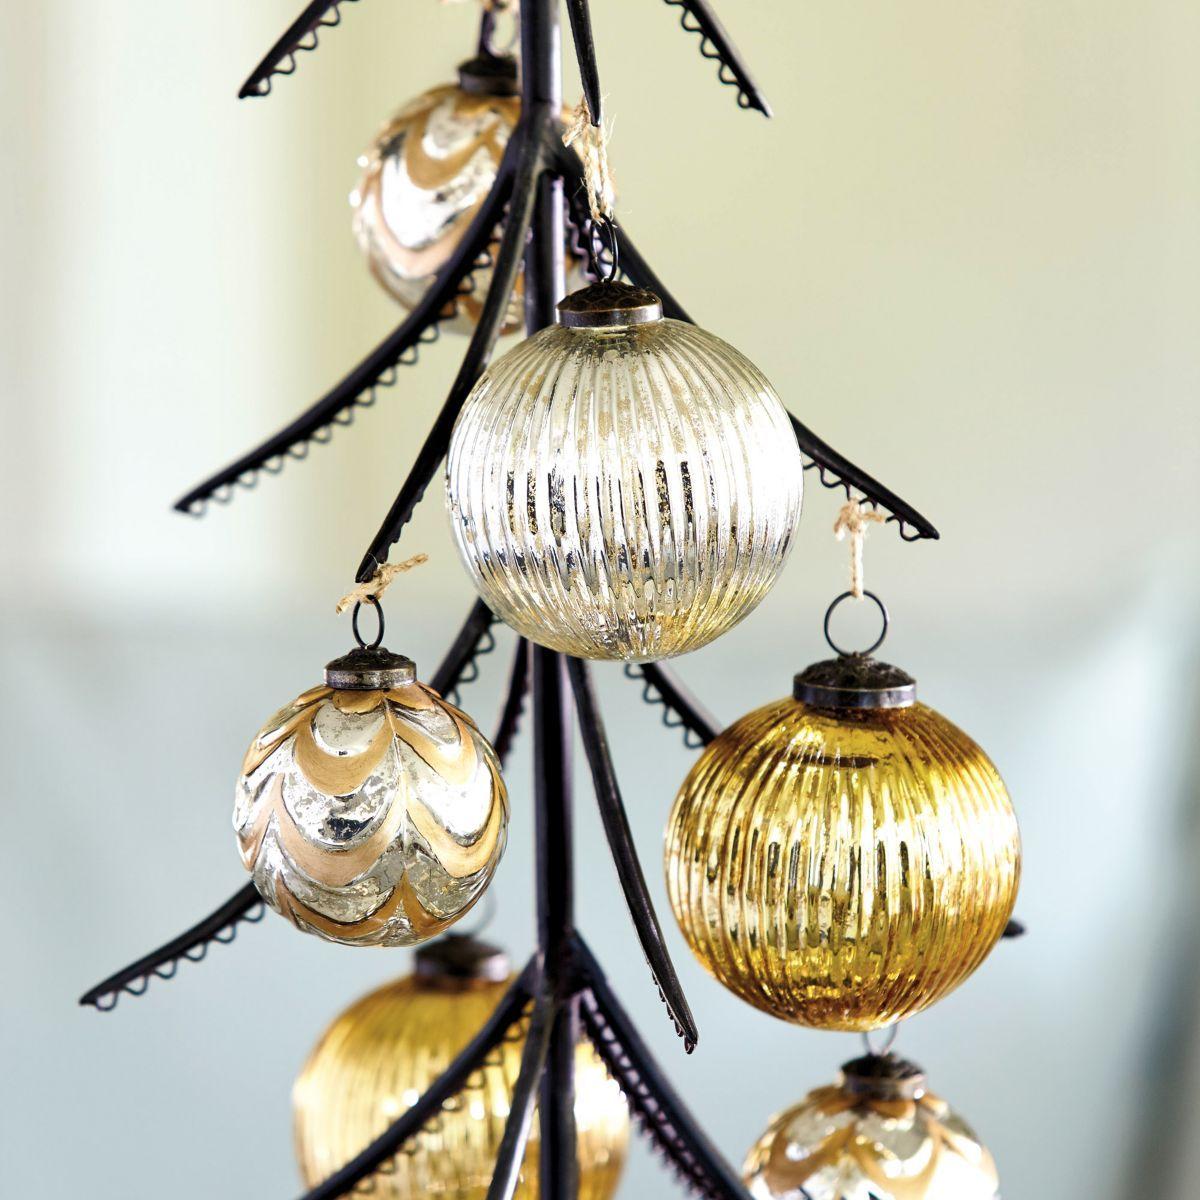 Mercury Balls Decorations Fluted Mercury Glass Ornaments  Set Of 3  Christmas  Pinterest